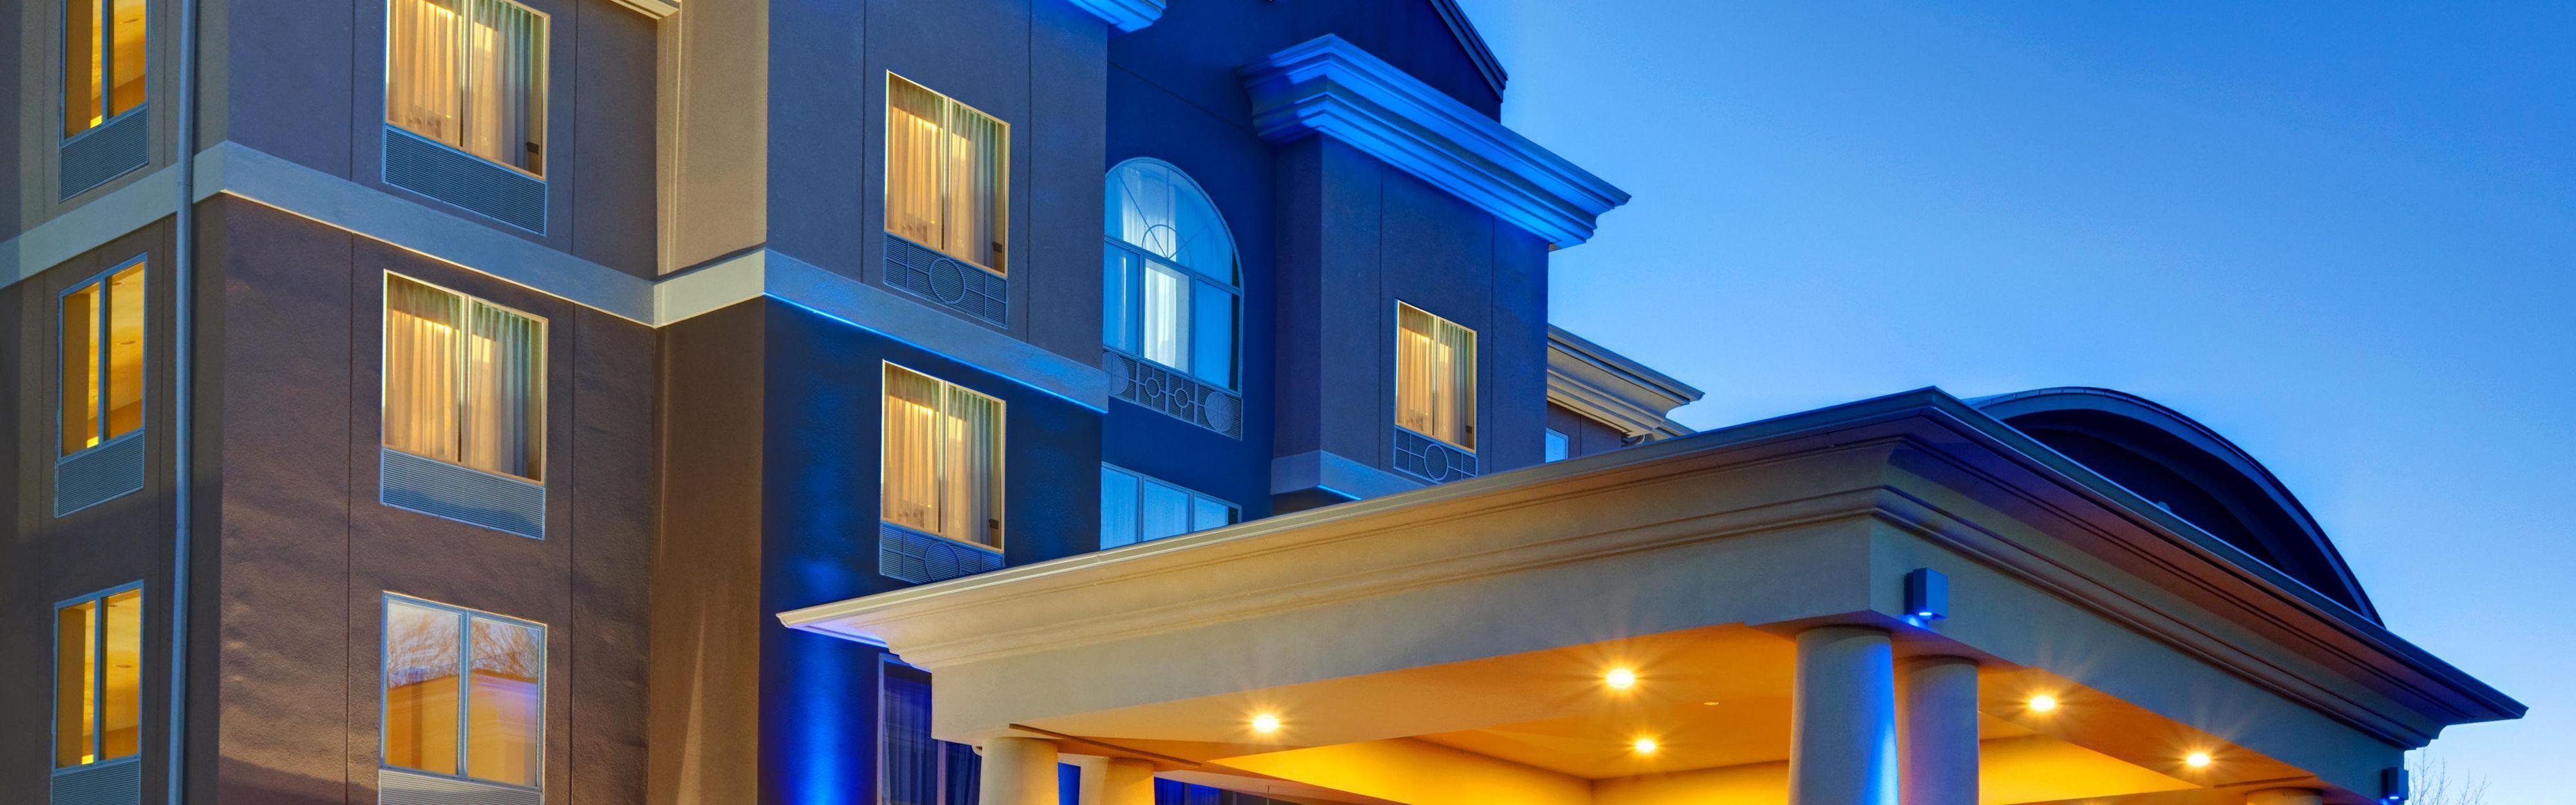 Holiday Inn Express & Suites Hamburg image 0